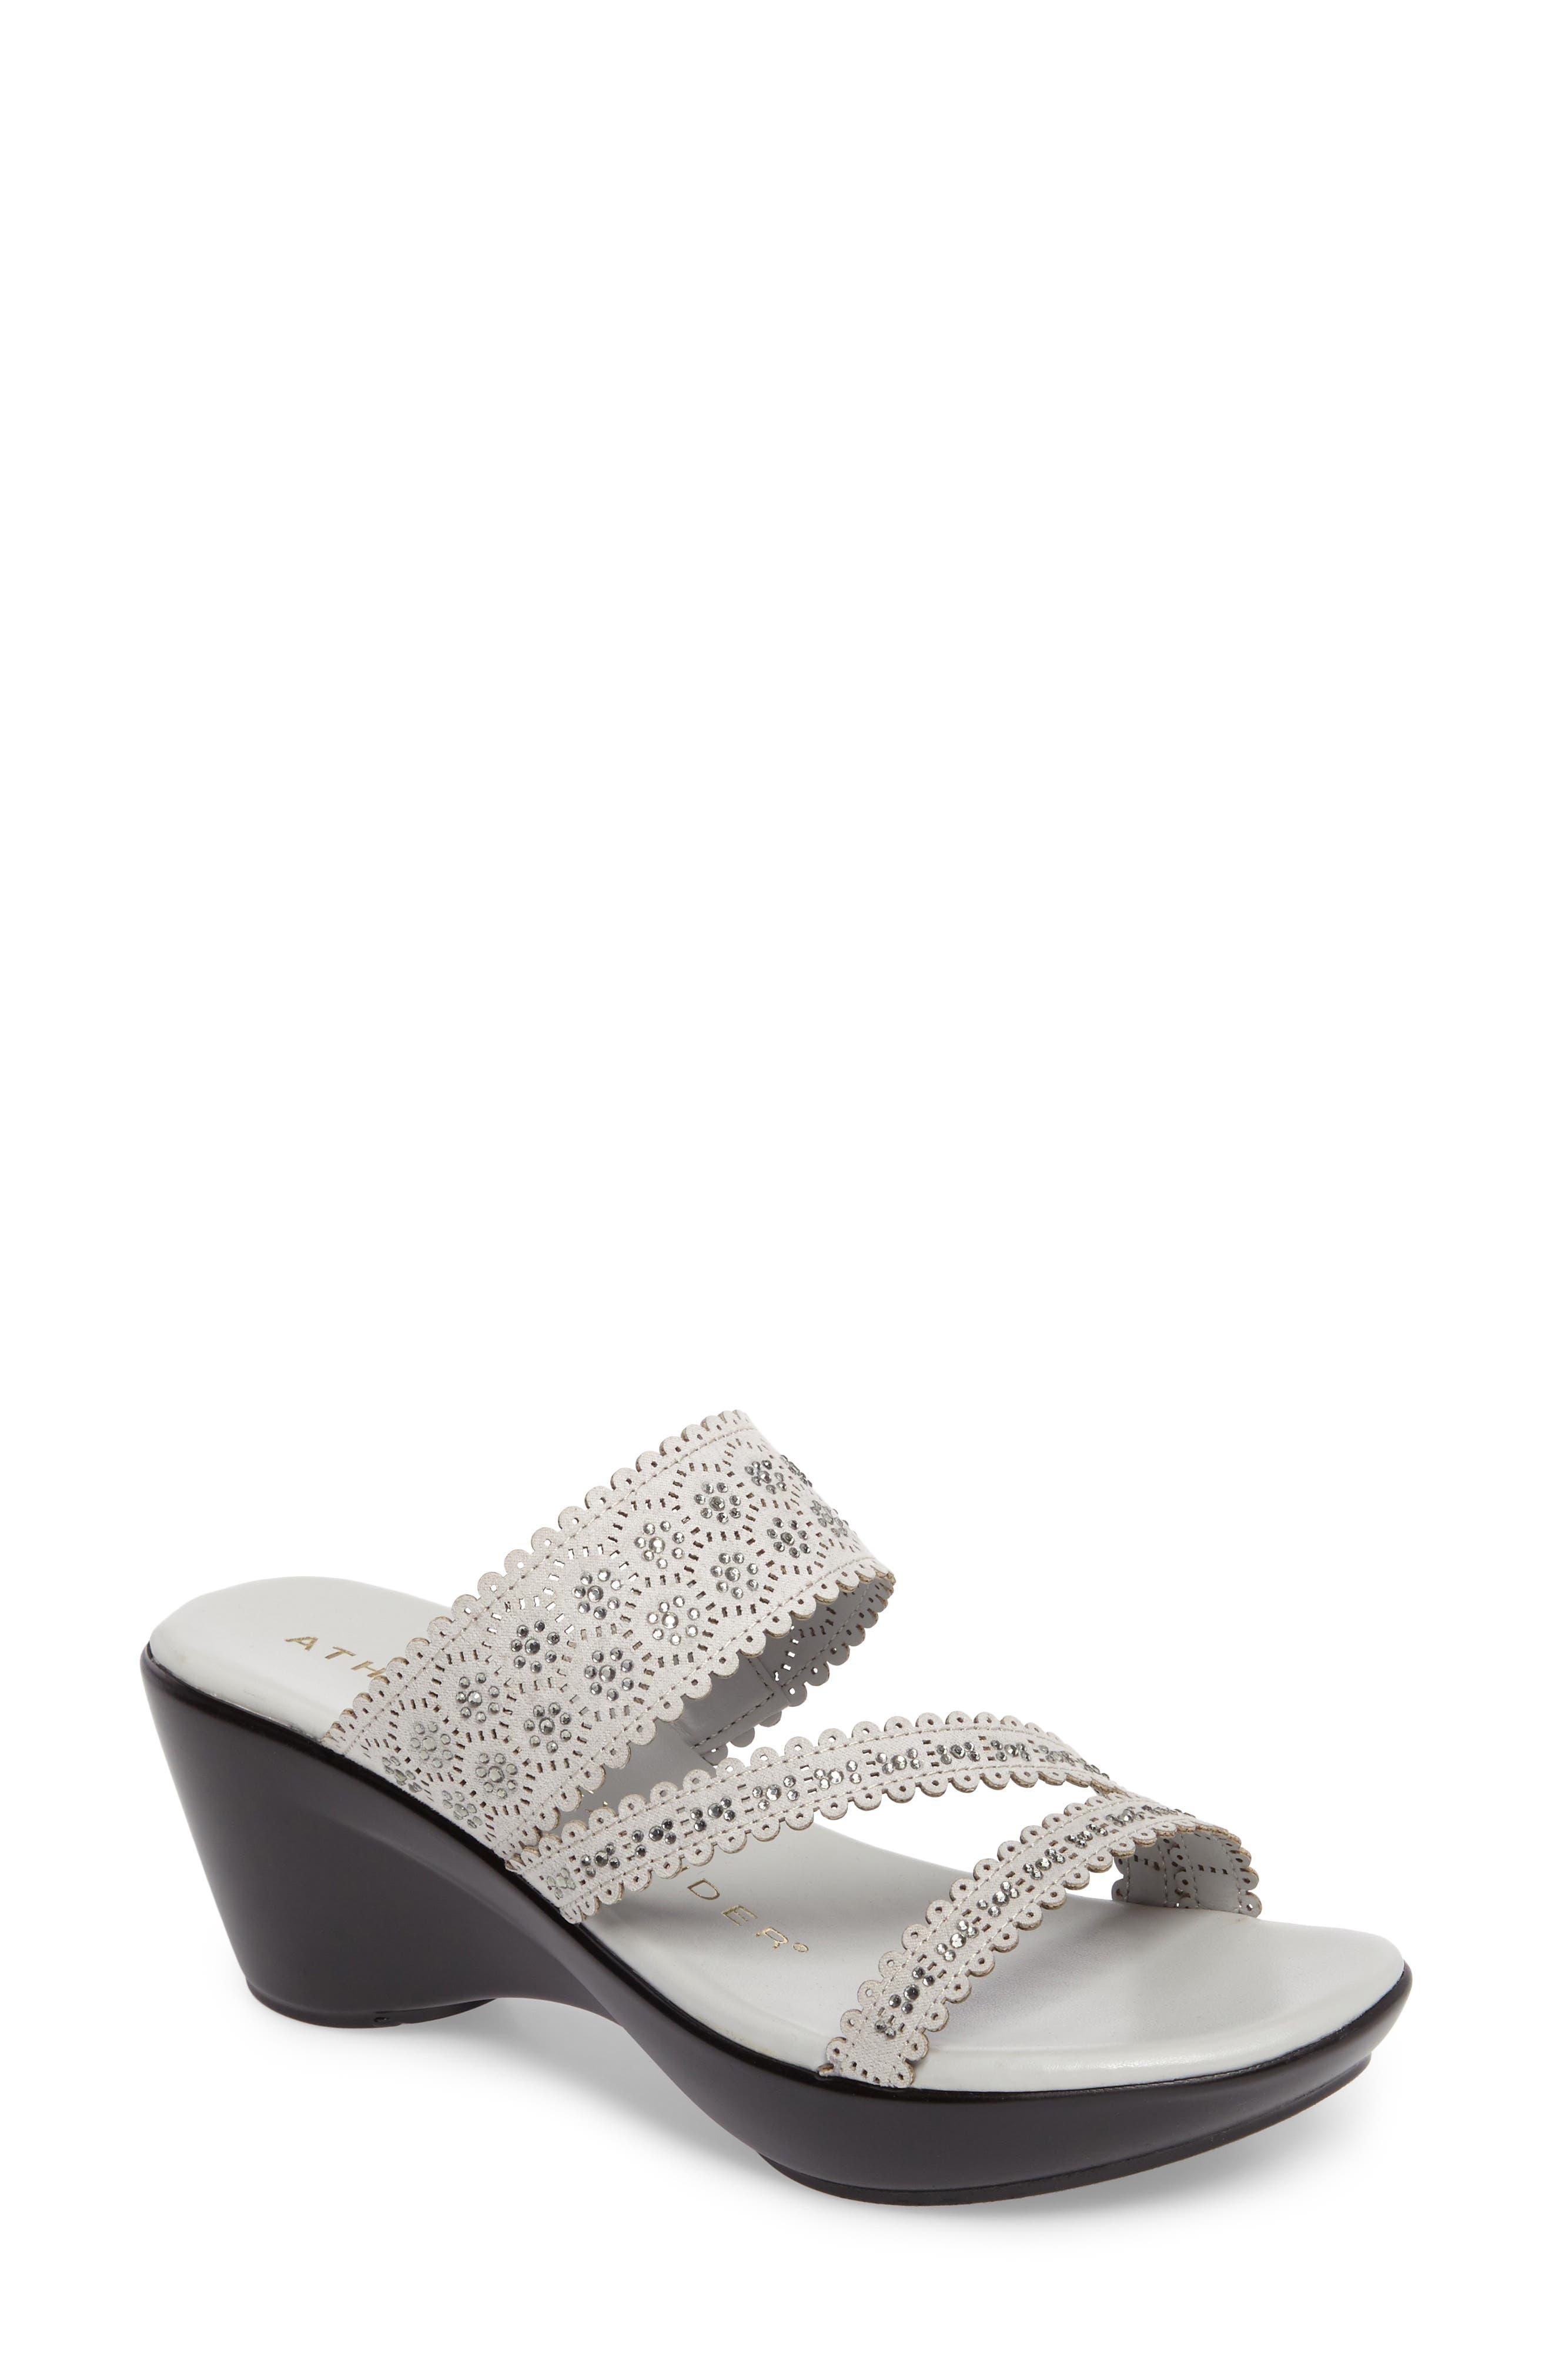 Main Image - Athena Alexander Poppy Wedge Sandal (Women)